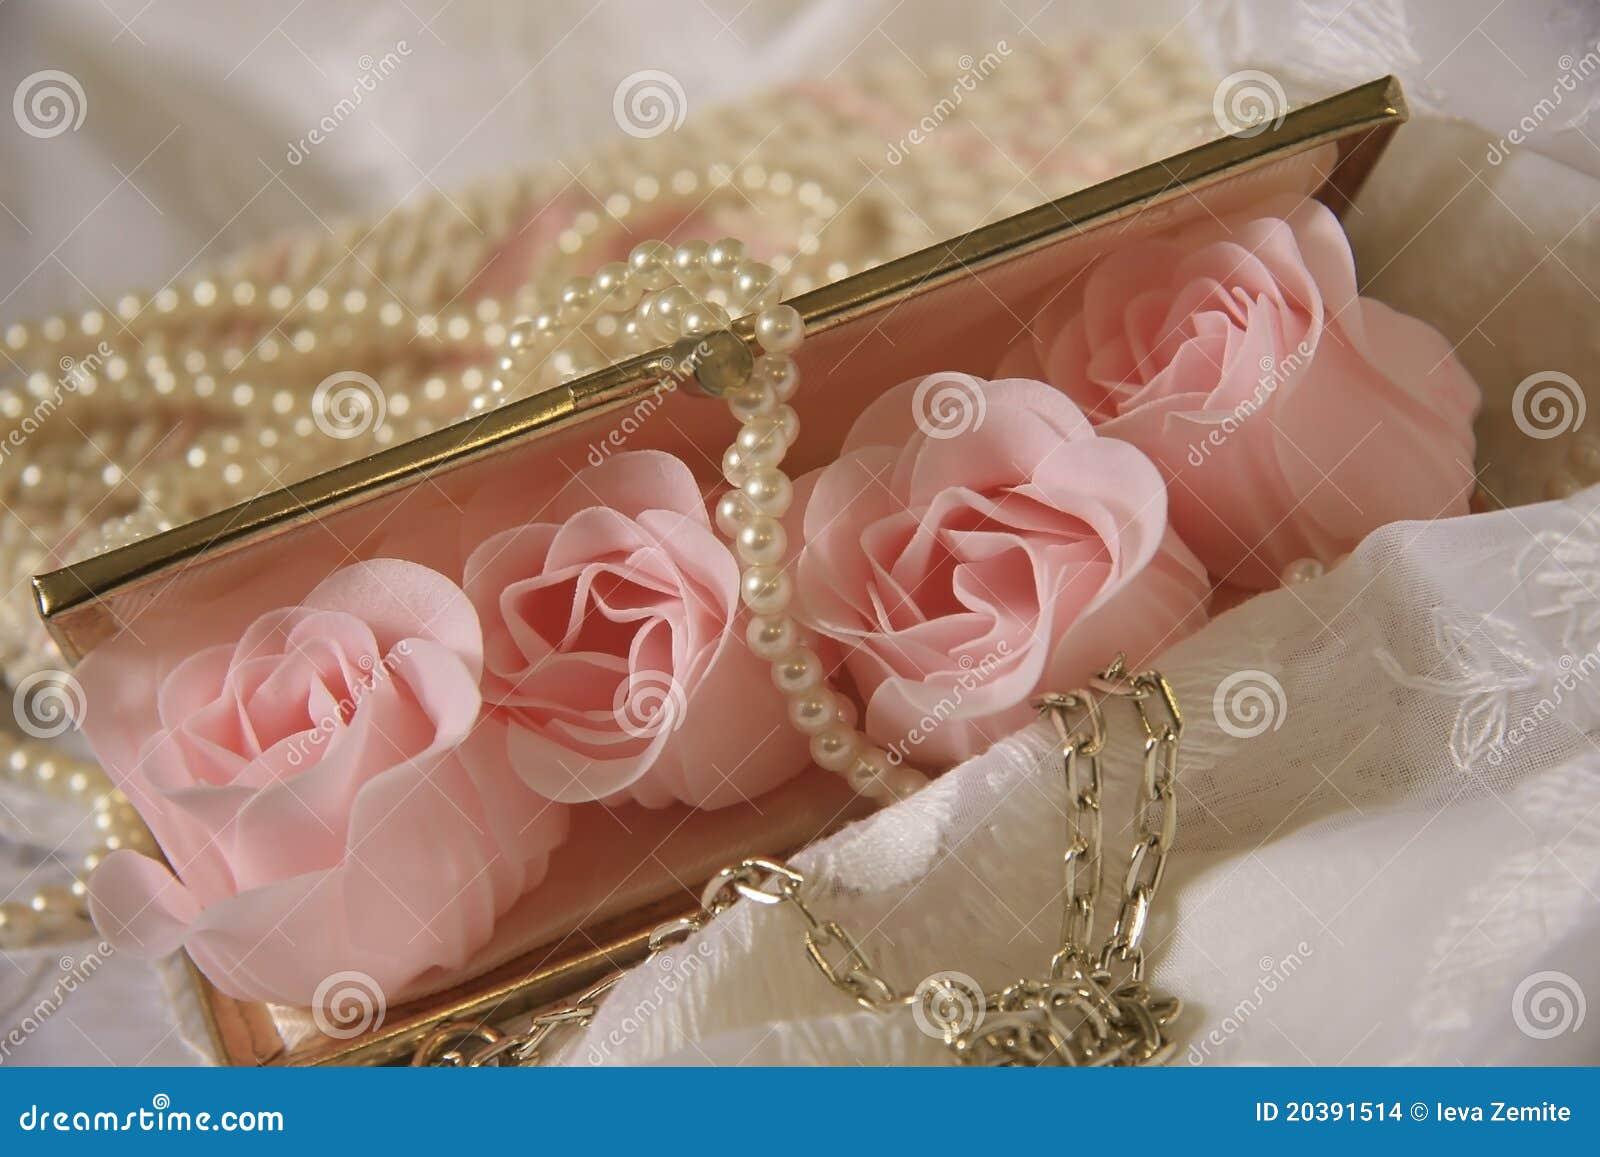 Wedding accessories pearls flowers pearls - Accessories Background Pearls Purse Wedding